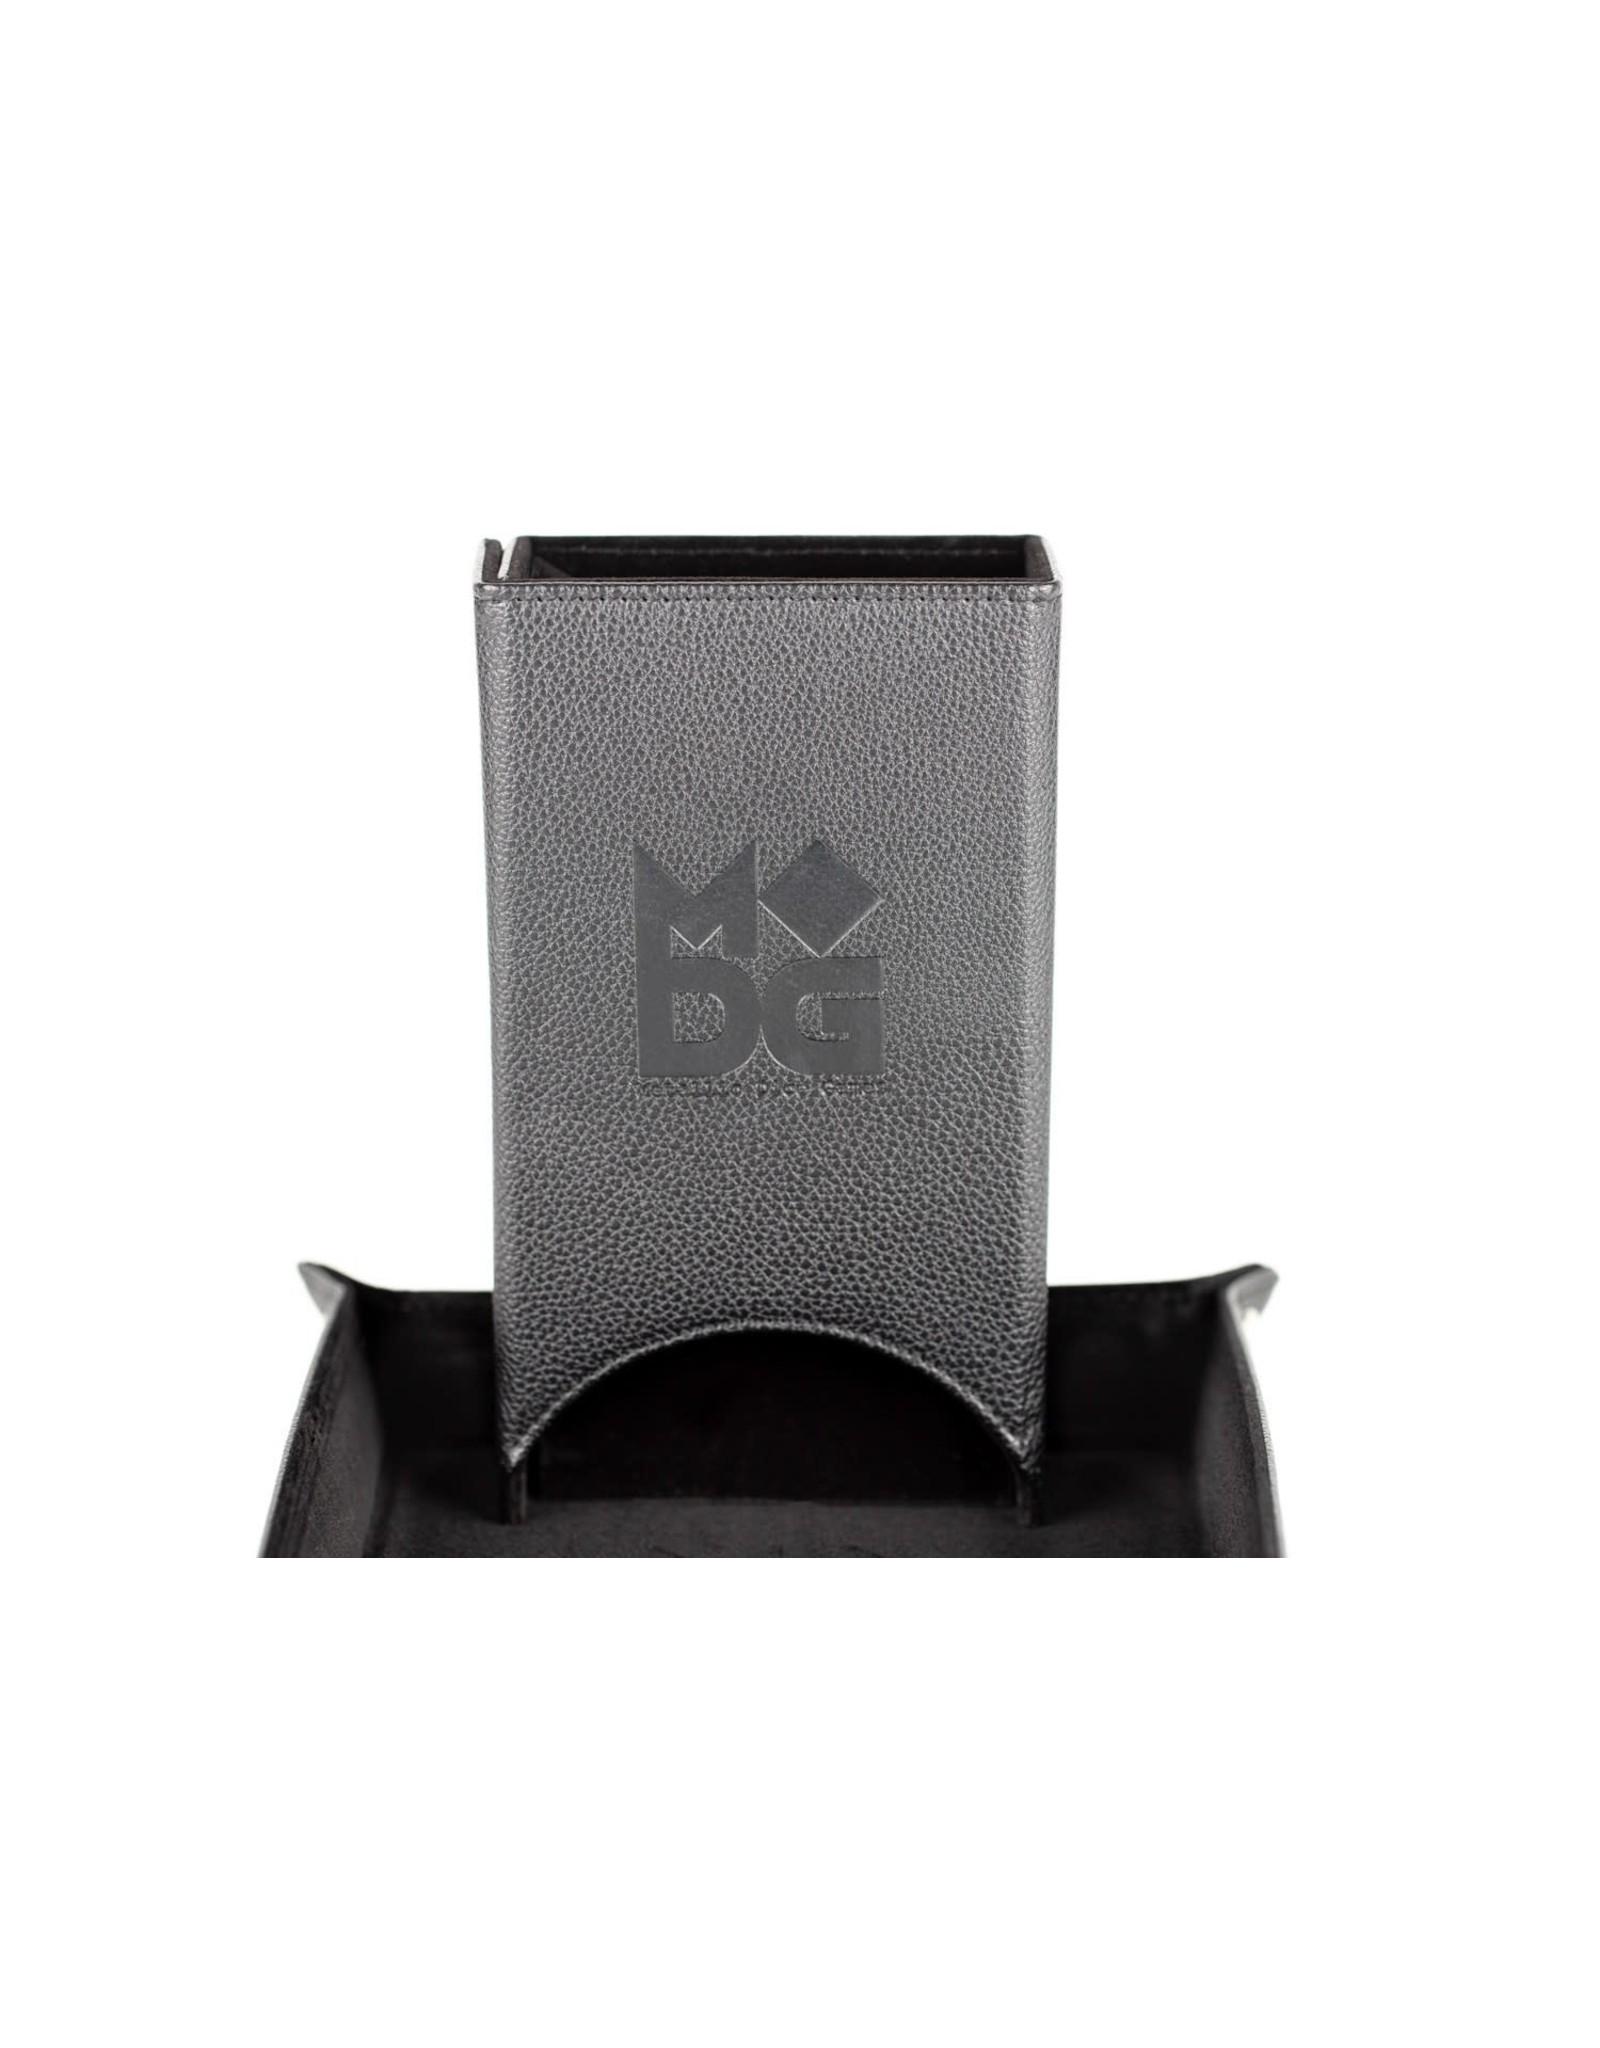 Metallic Dice Games Velvet Folding Dice Tower: Black